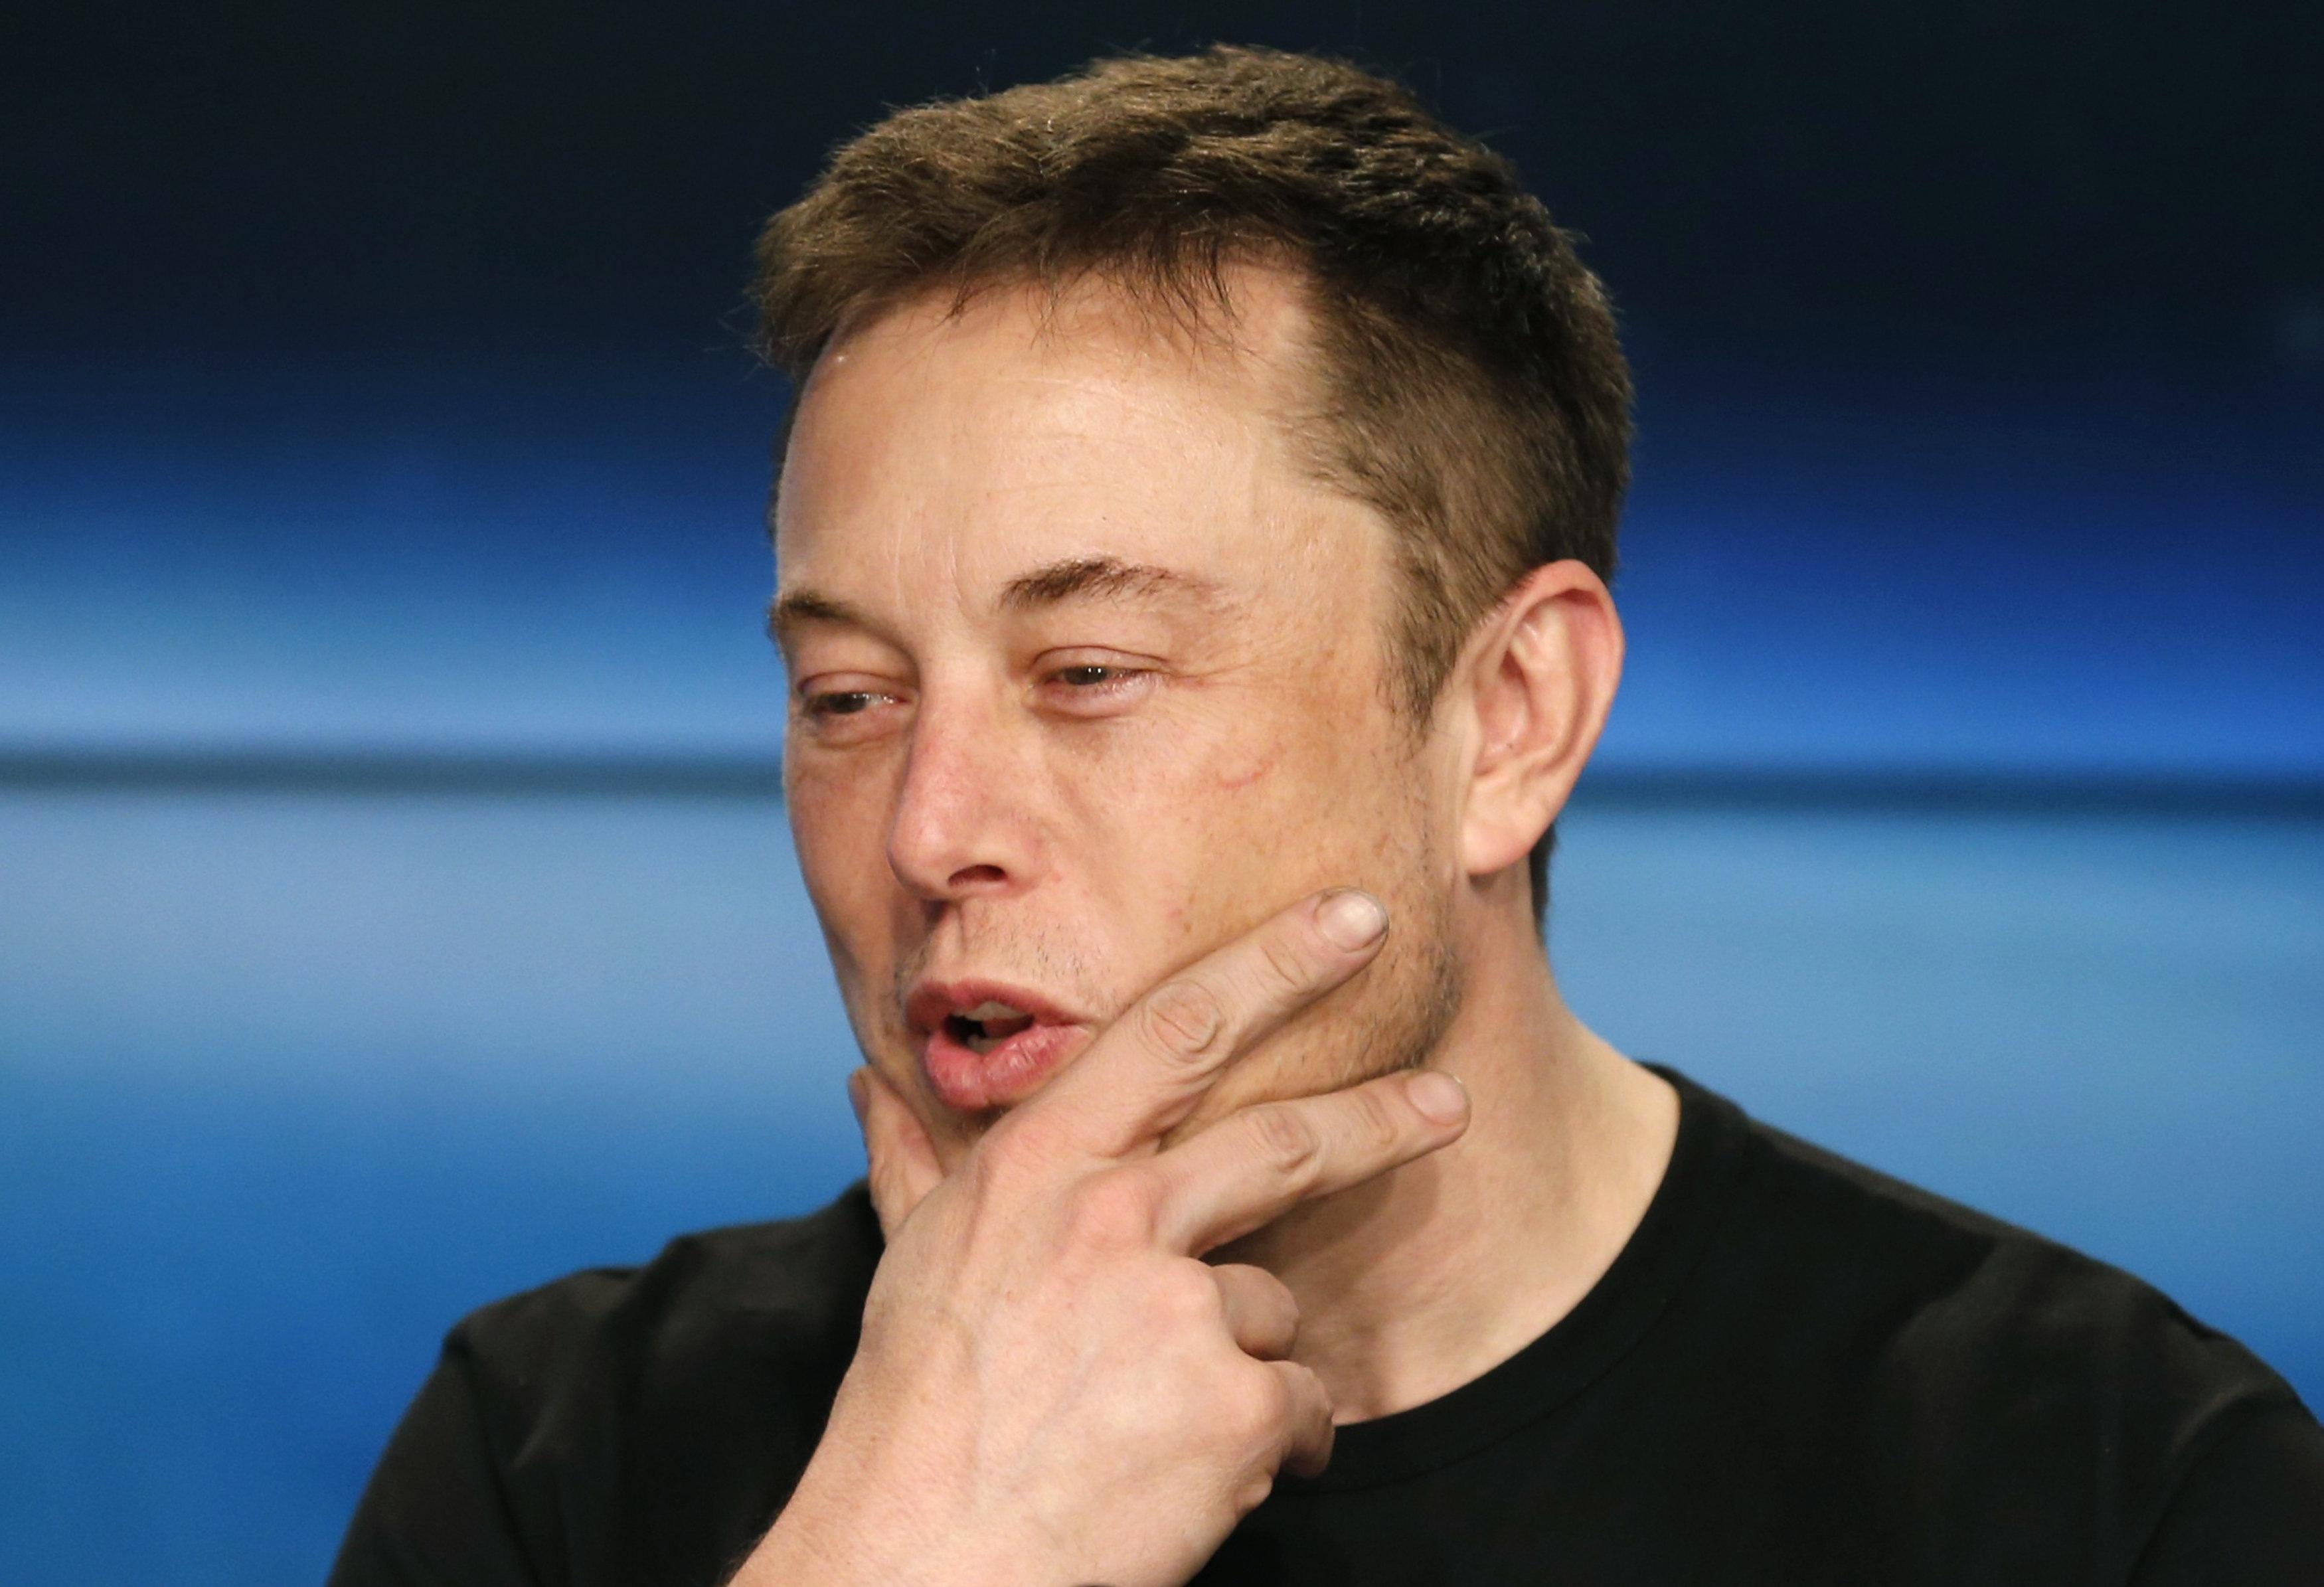 Elon Musk Tweets Prompt Criminal Probe By Justice